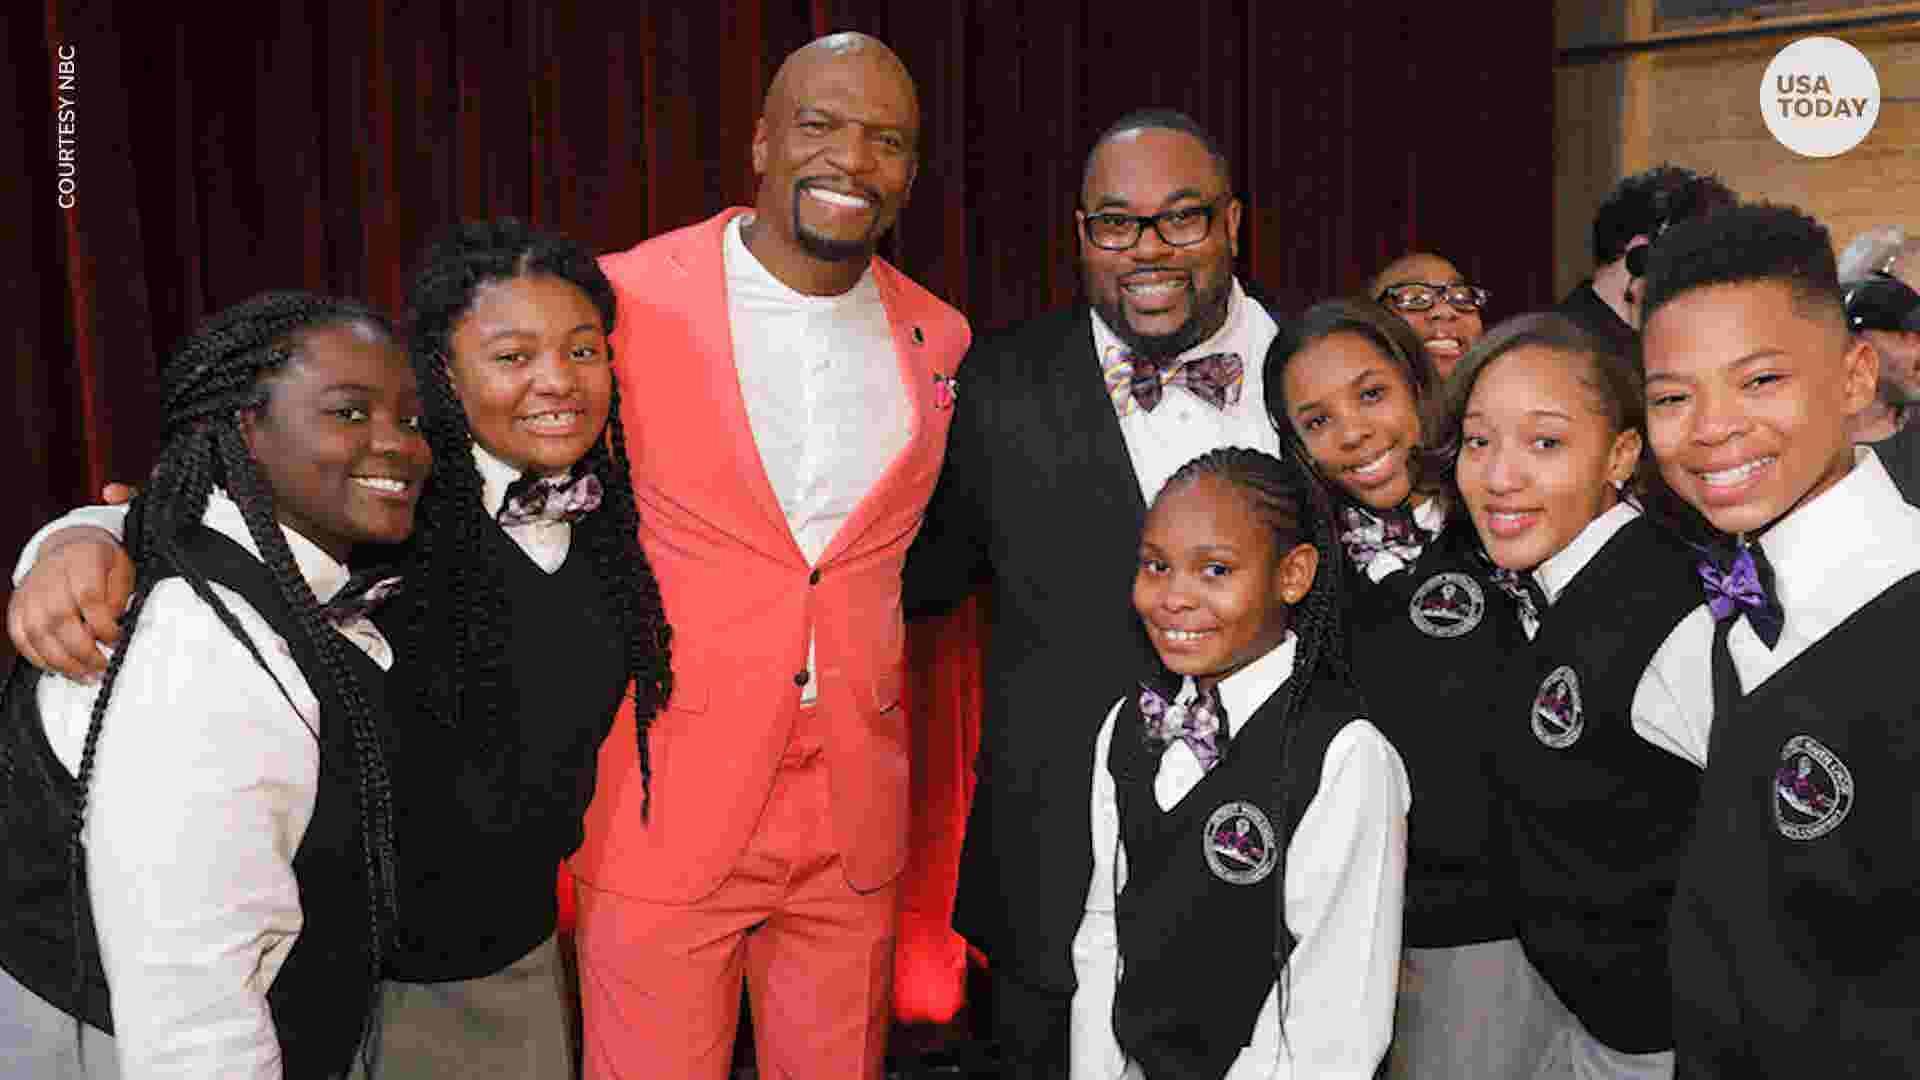 An emotional Terry Crews hits golden buzzer for Detroit Youth Choir